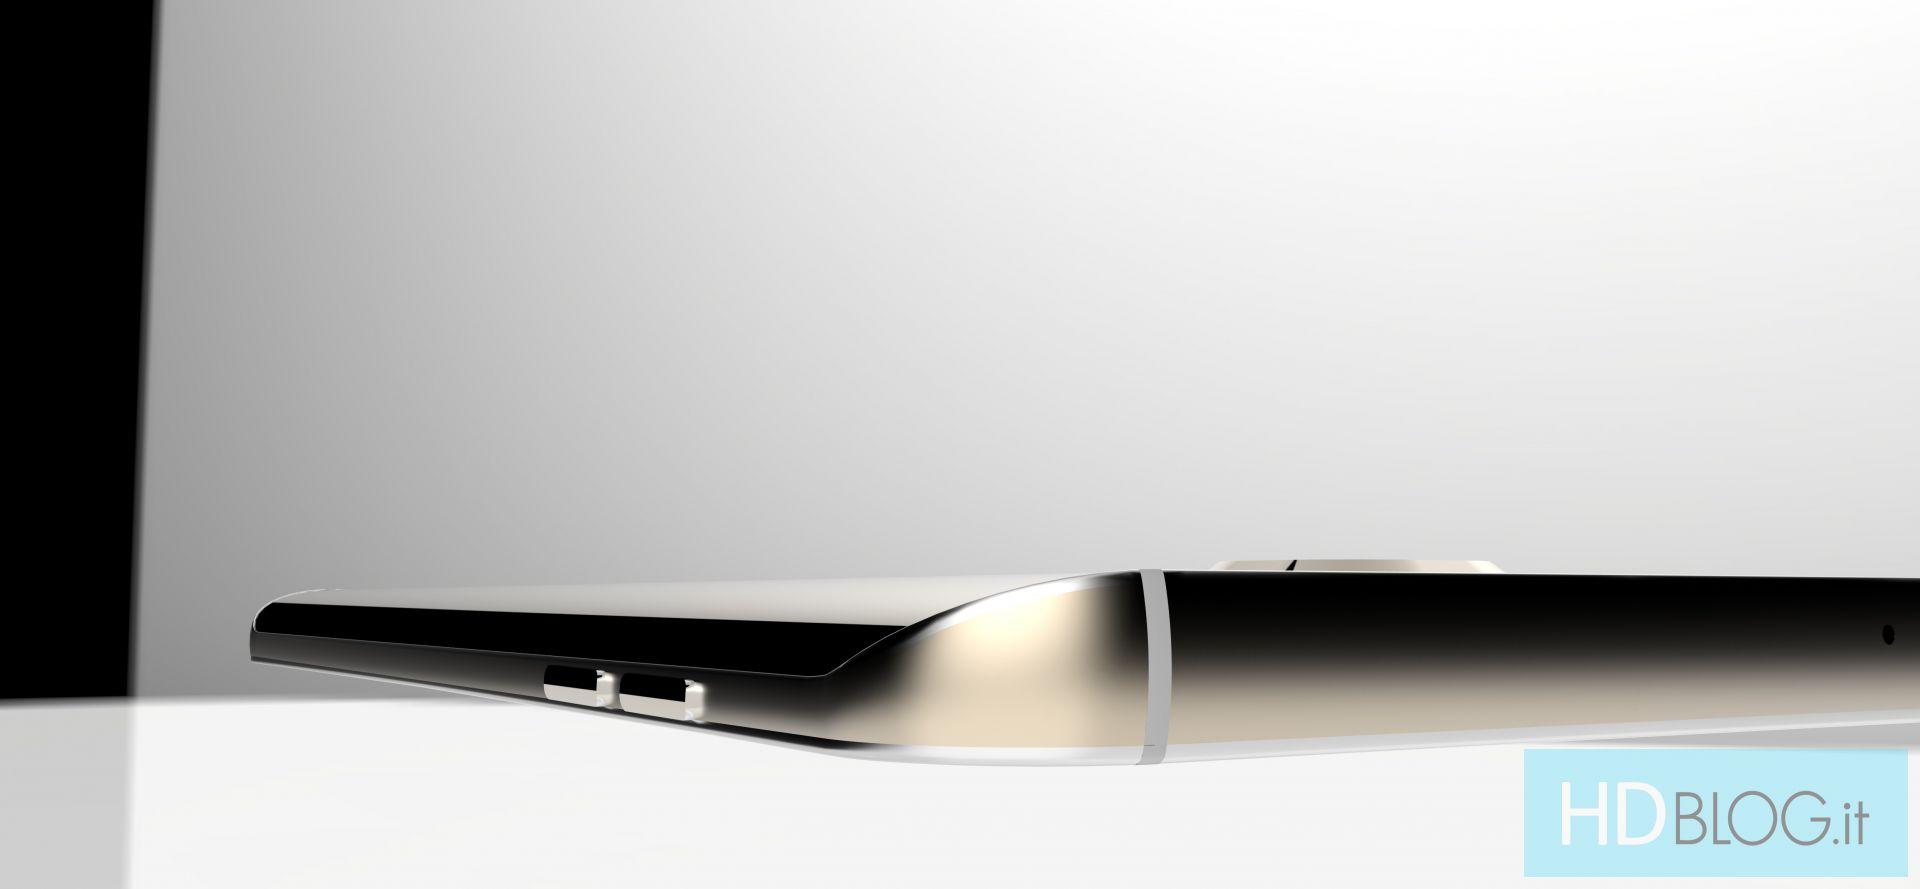 Galaxy-Note-5-schematics-and-concept-renders-13.jpg